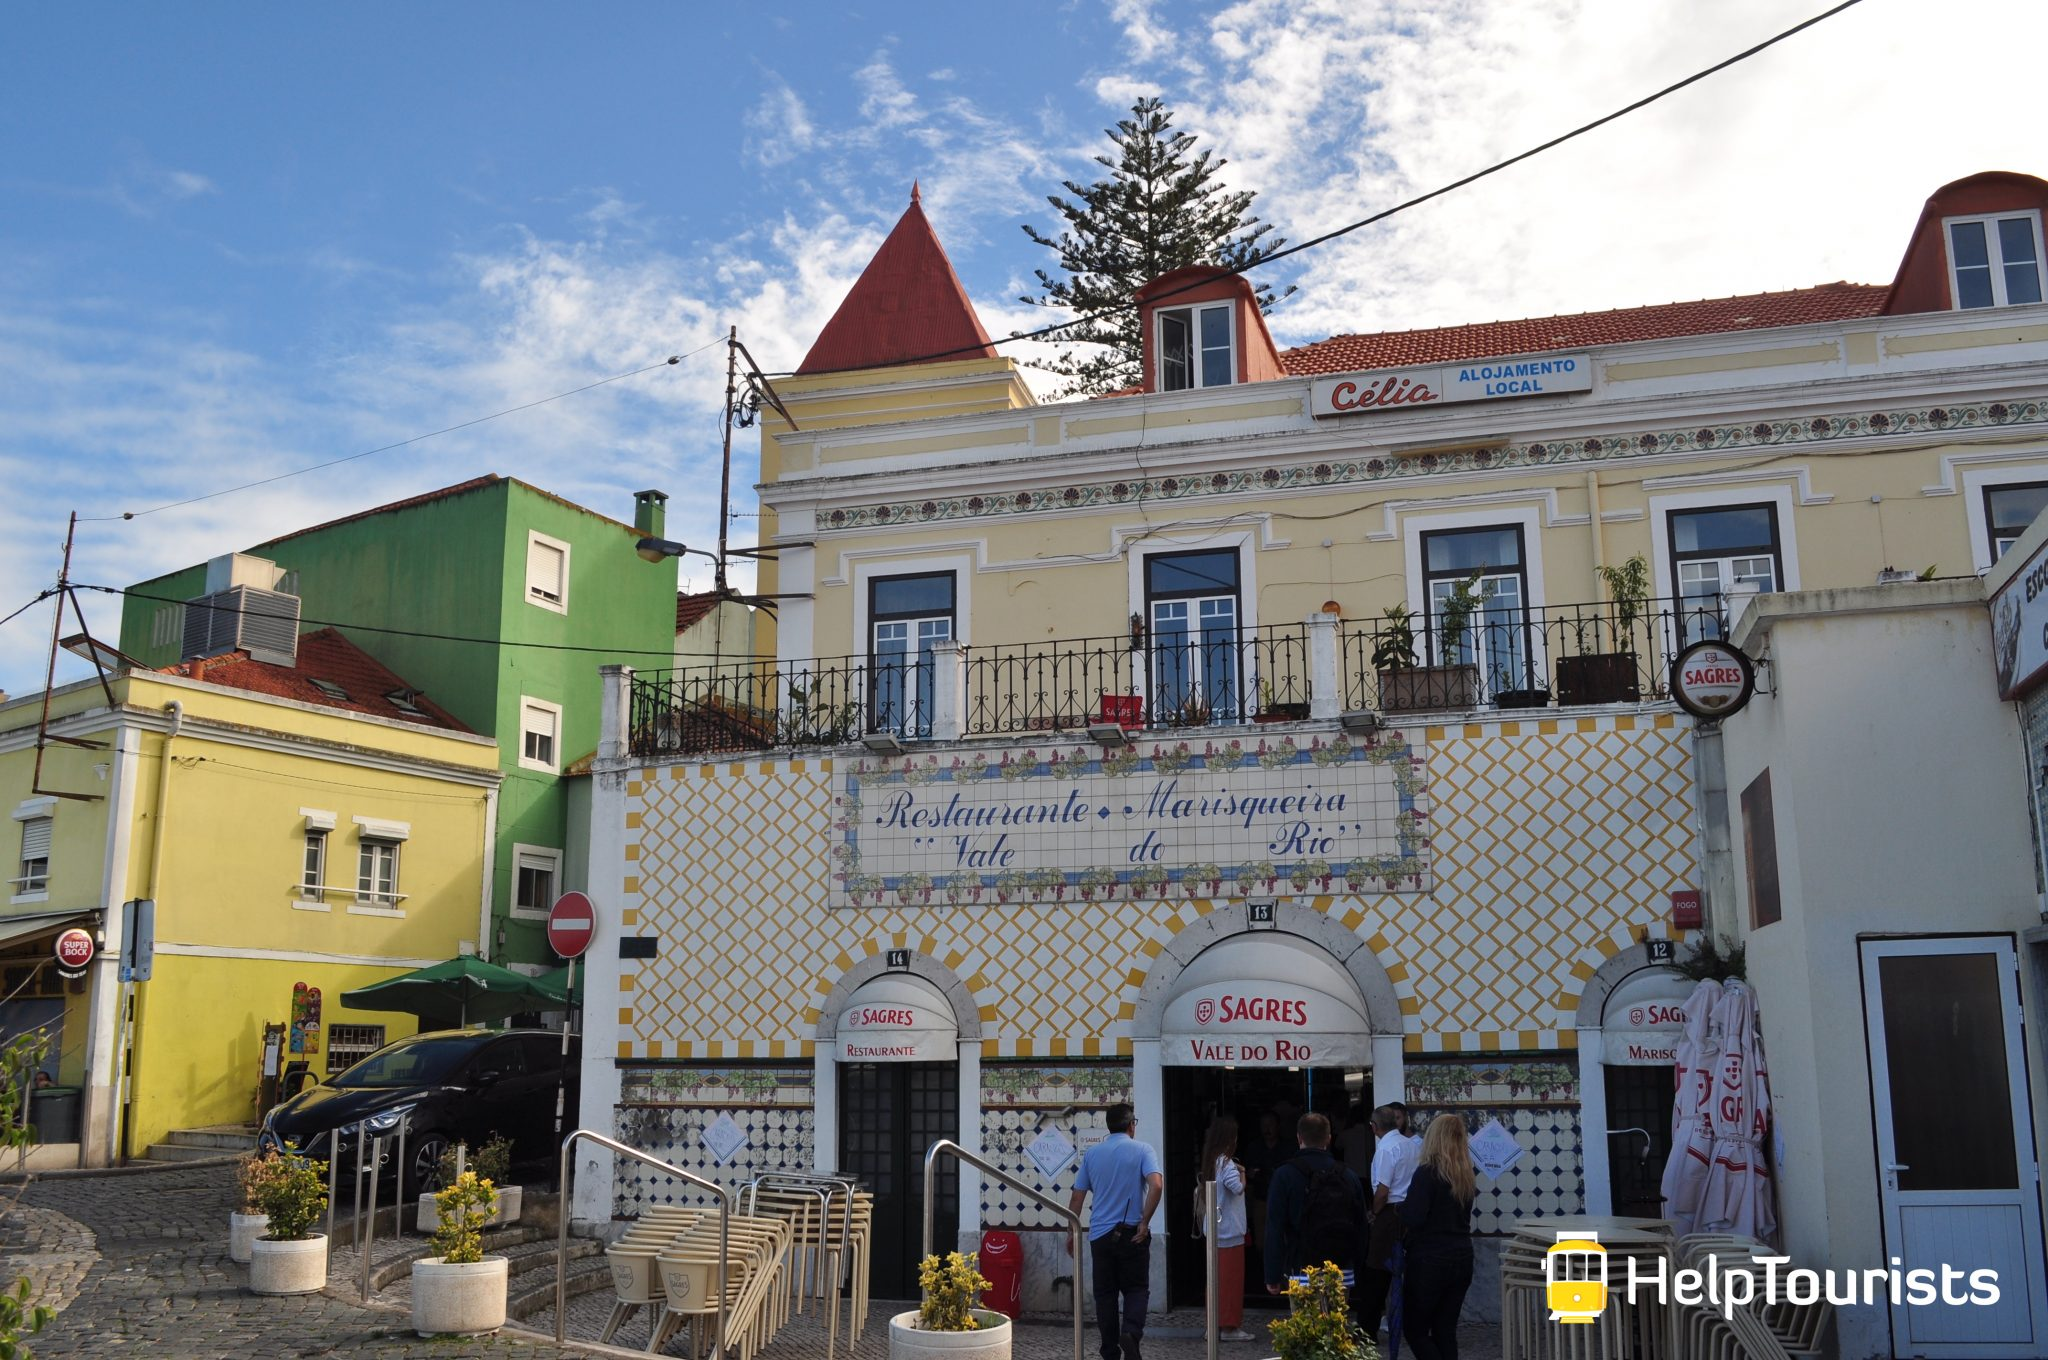 Lissabon Südufer Restaurant